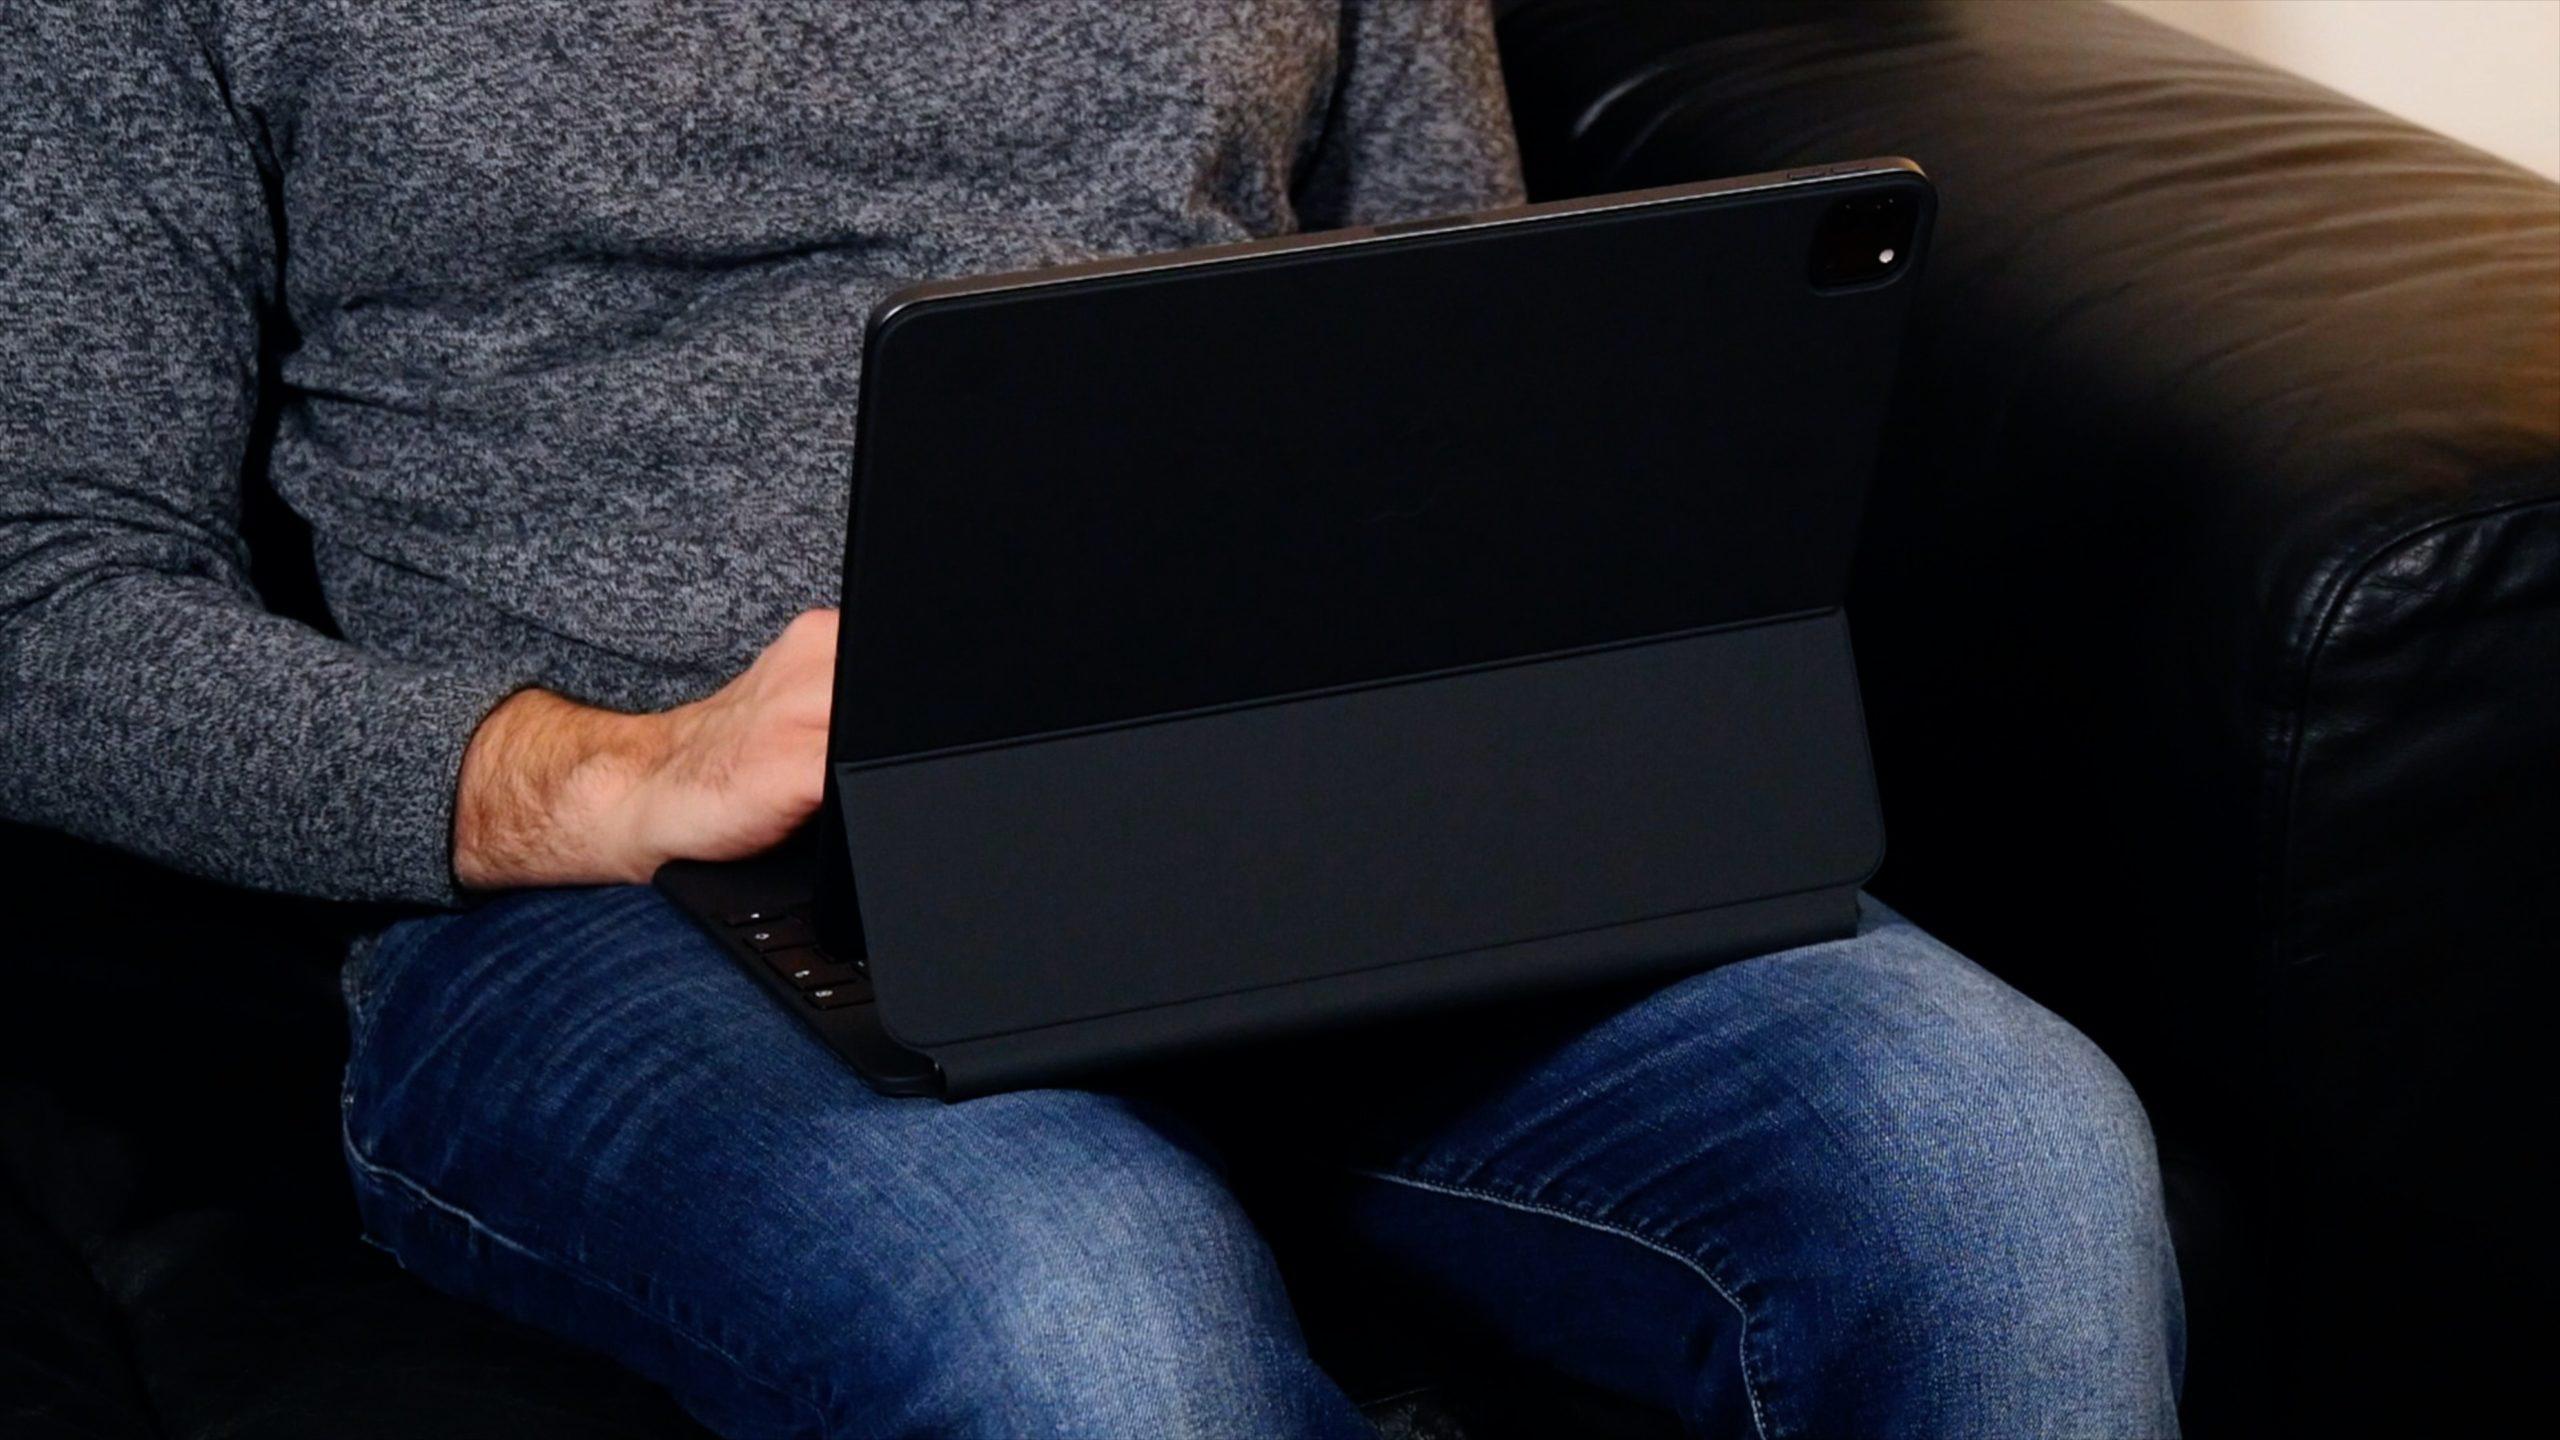 Magic Keyboard iPad Pro 2020 20